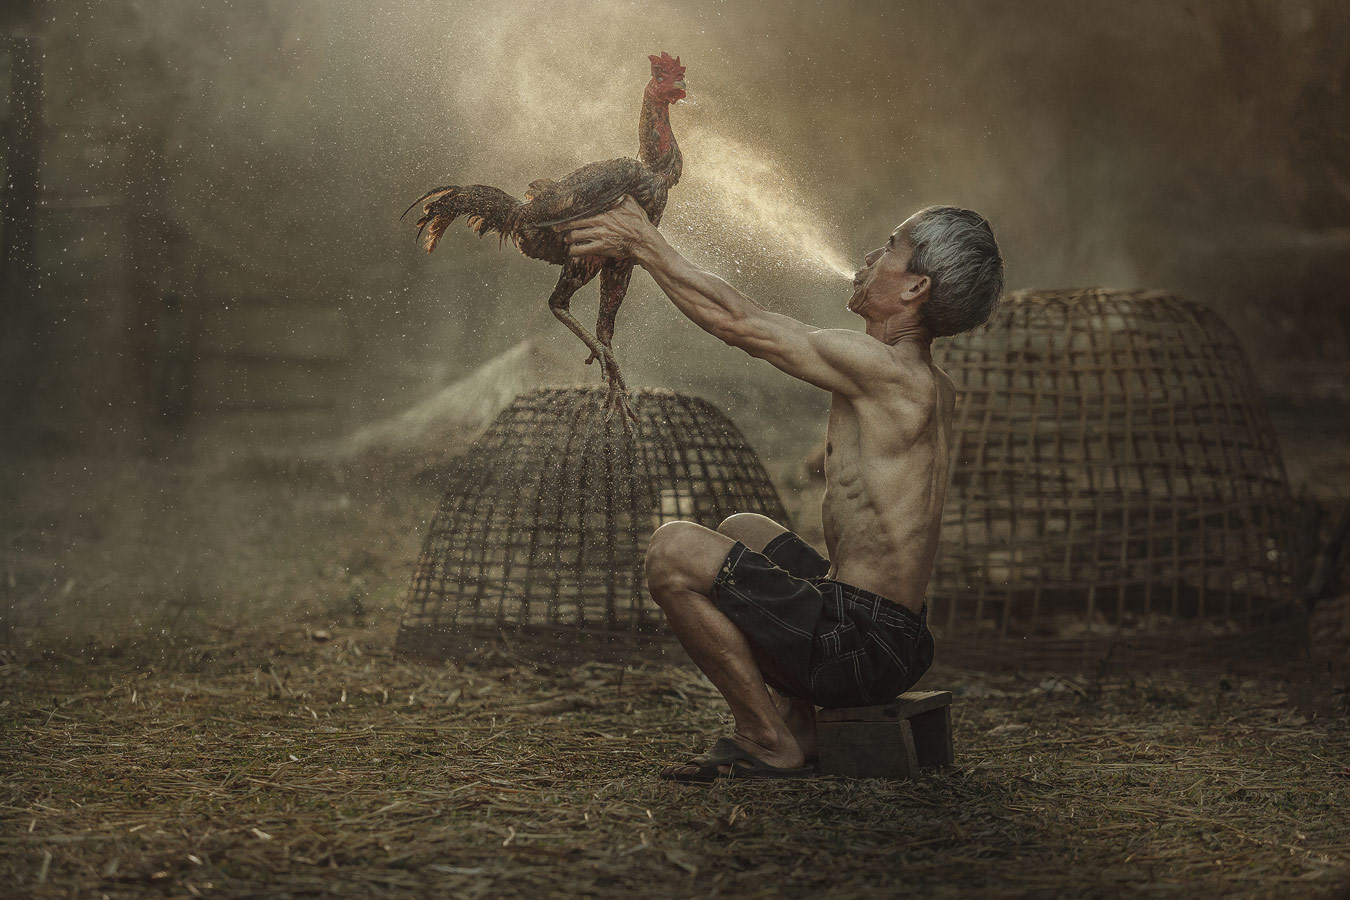 Человек, убирающий тайского бойцового петуха, © Жаккри Тампитаккулл / Jakkree Thampitakkull, 2 место в номинации «Портрет», Фотоконкурс 35AWARDS — 100 Best Photos